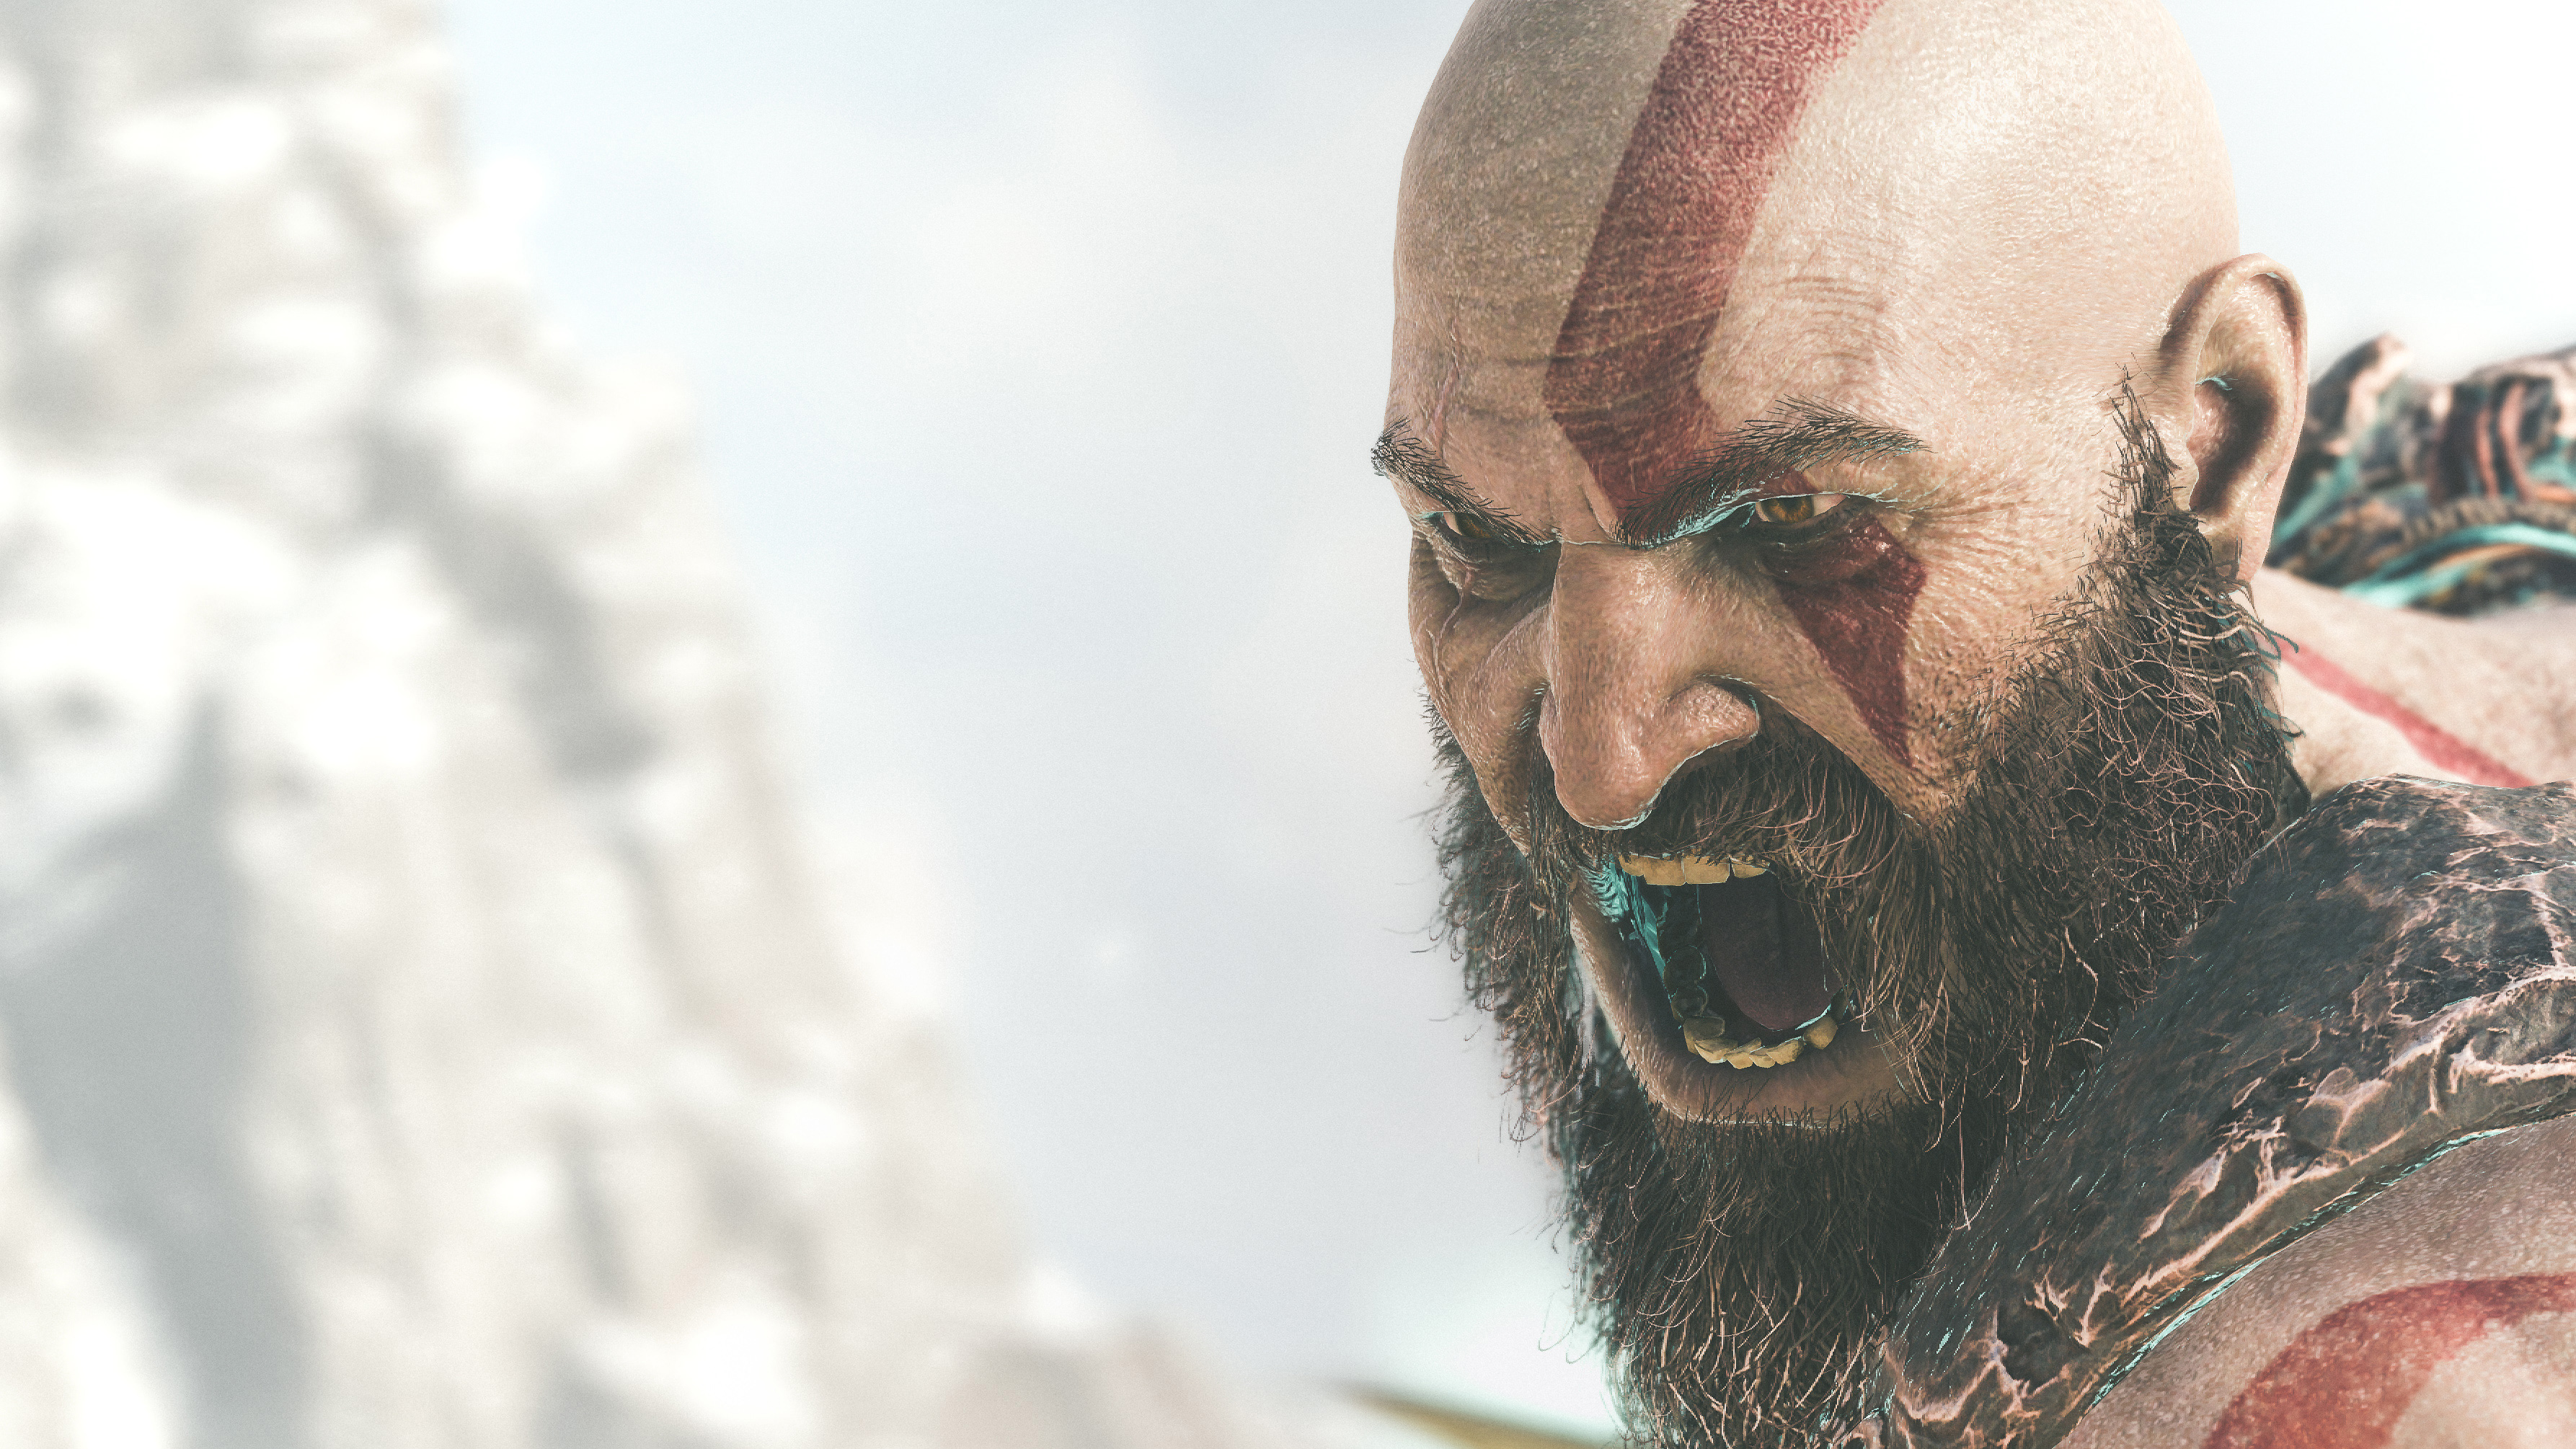 1024x768 2018 Kratos God Of War 4k 1024x768 Resolution Hd 4k